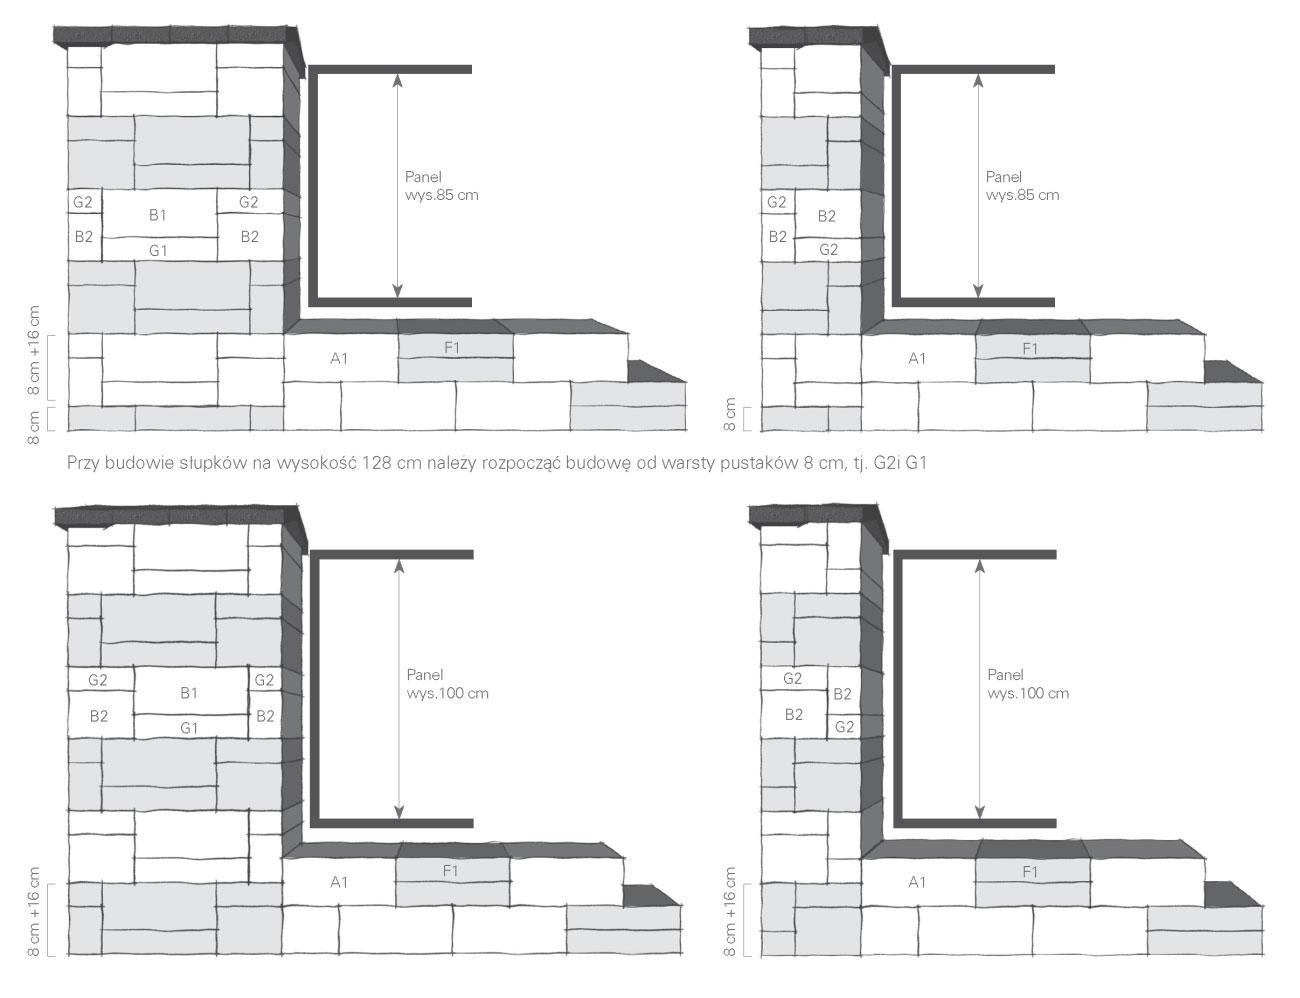 881x676-images-oferta-ogrodzenia-lupane-pattern5.jpg